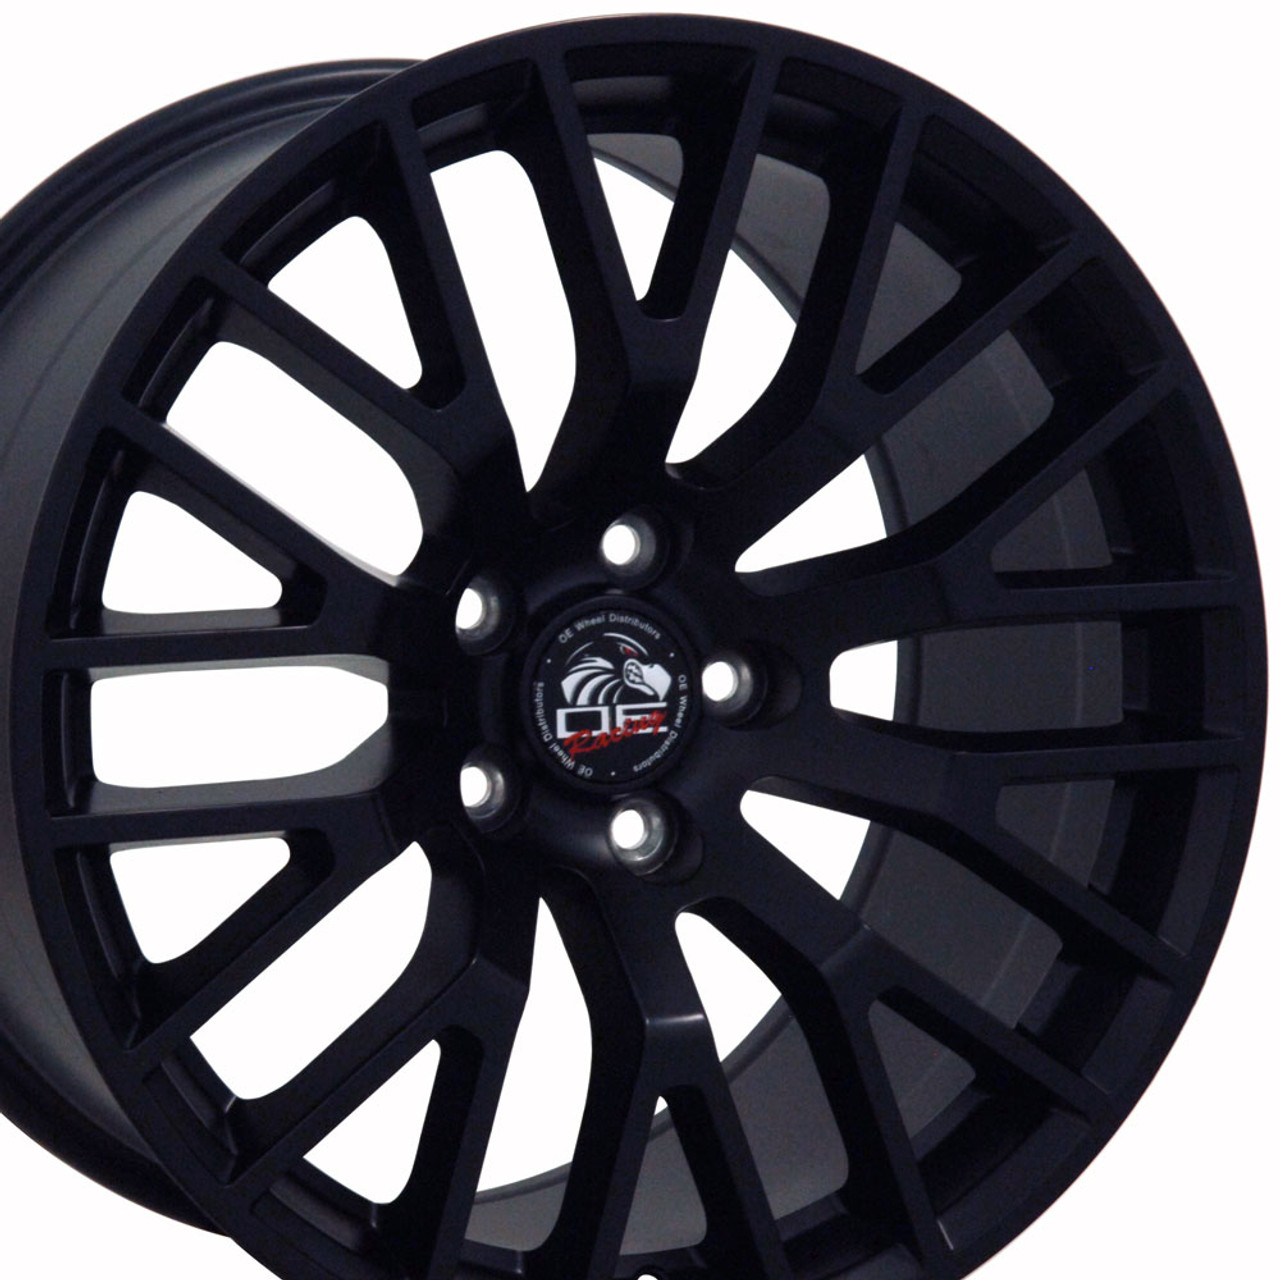 2015 Mustang Gt Wheels >> 18 Fits Ford 2015 Mustang Gt Wheel Matte Black 18x9